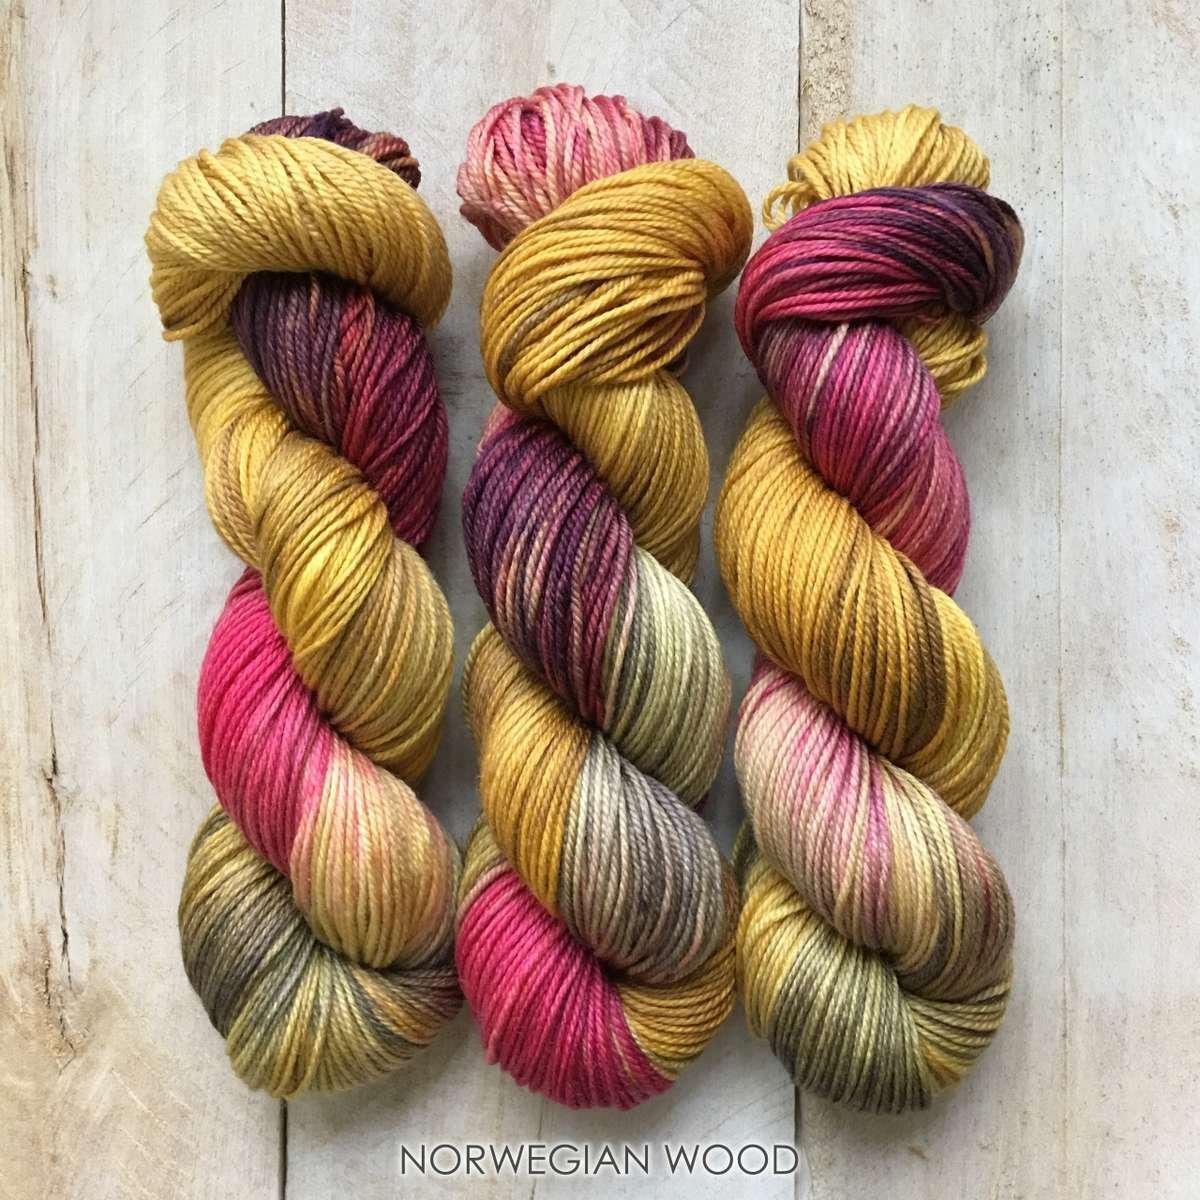 Hand-dyed yarn Louise Robert Norwegian wood